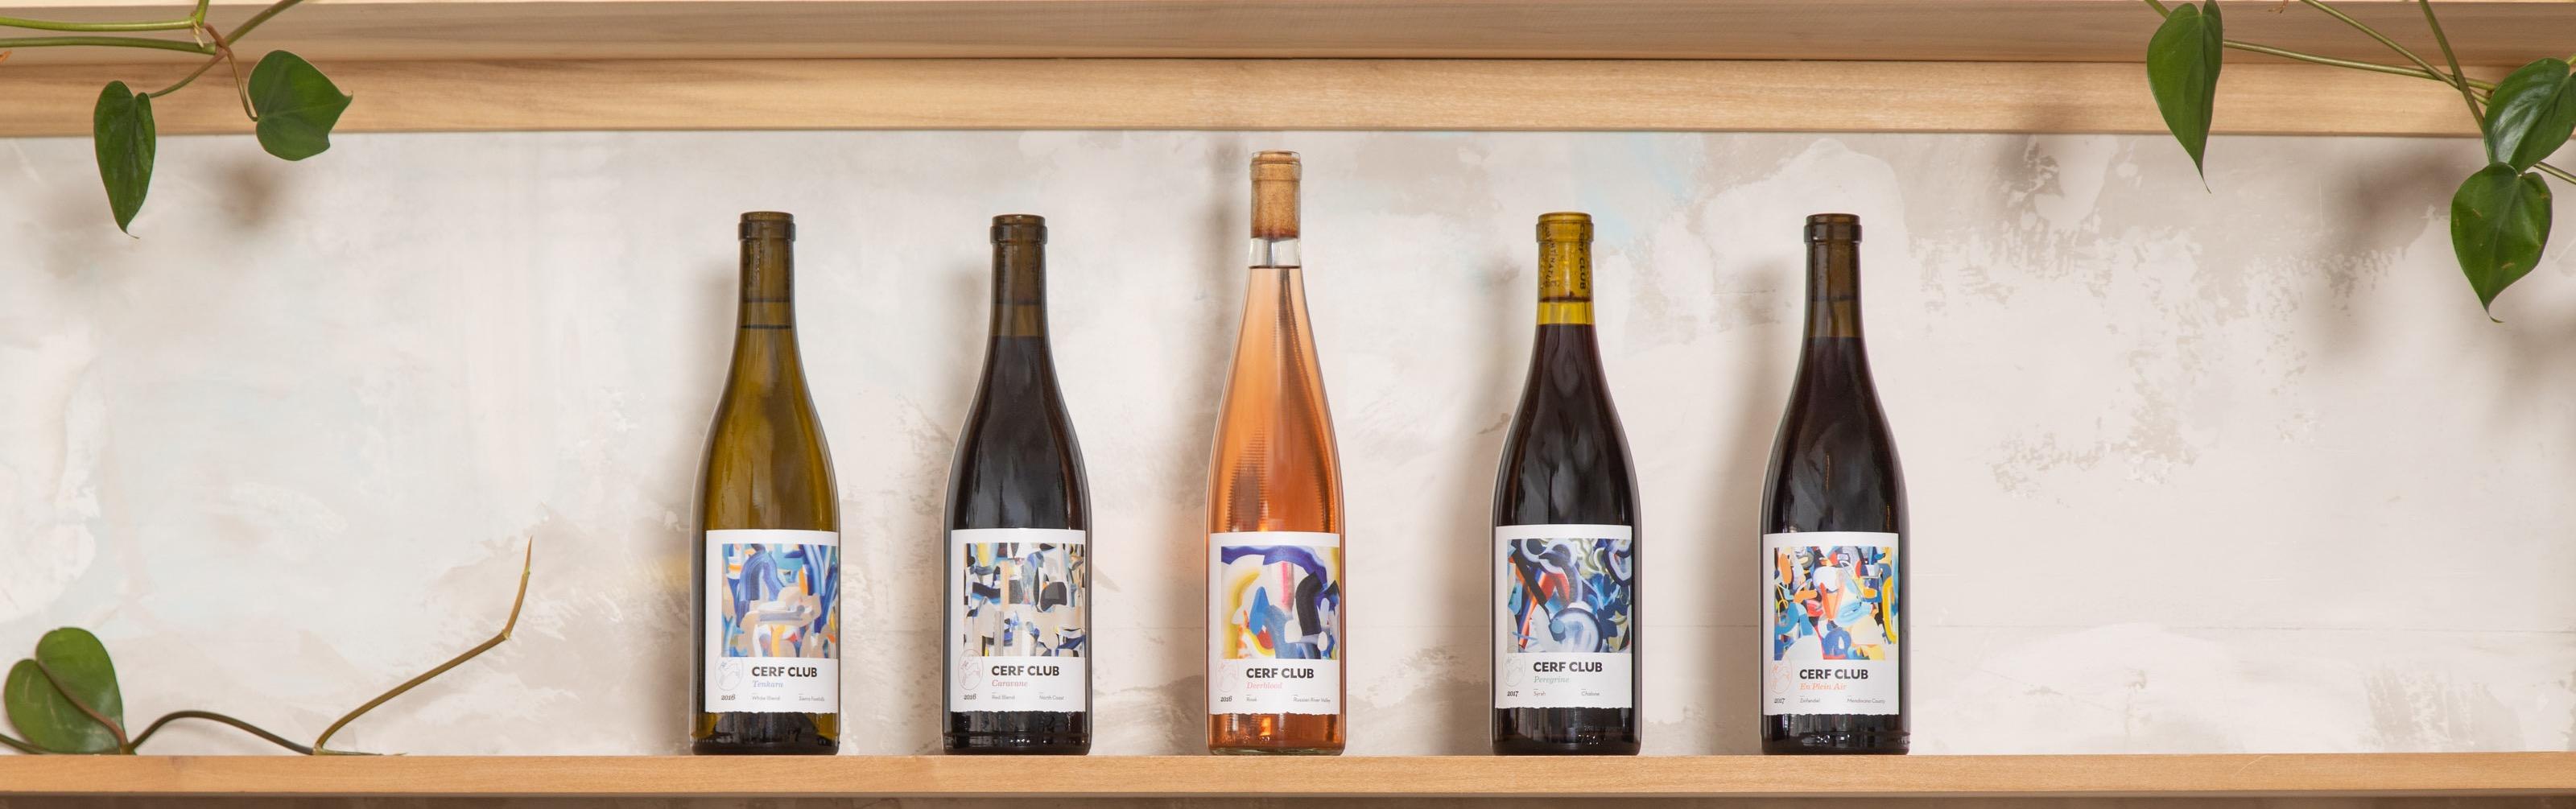 Cerf Club Wines